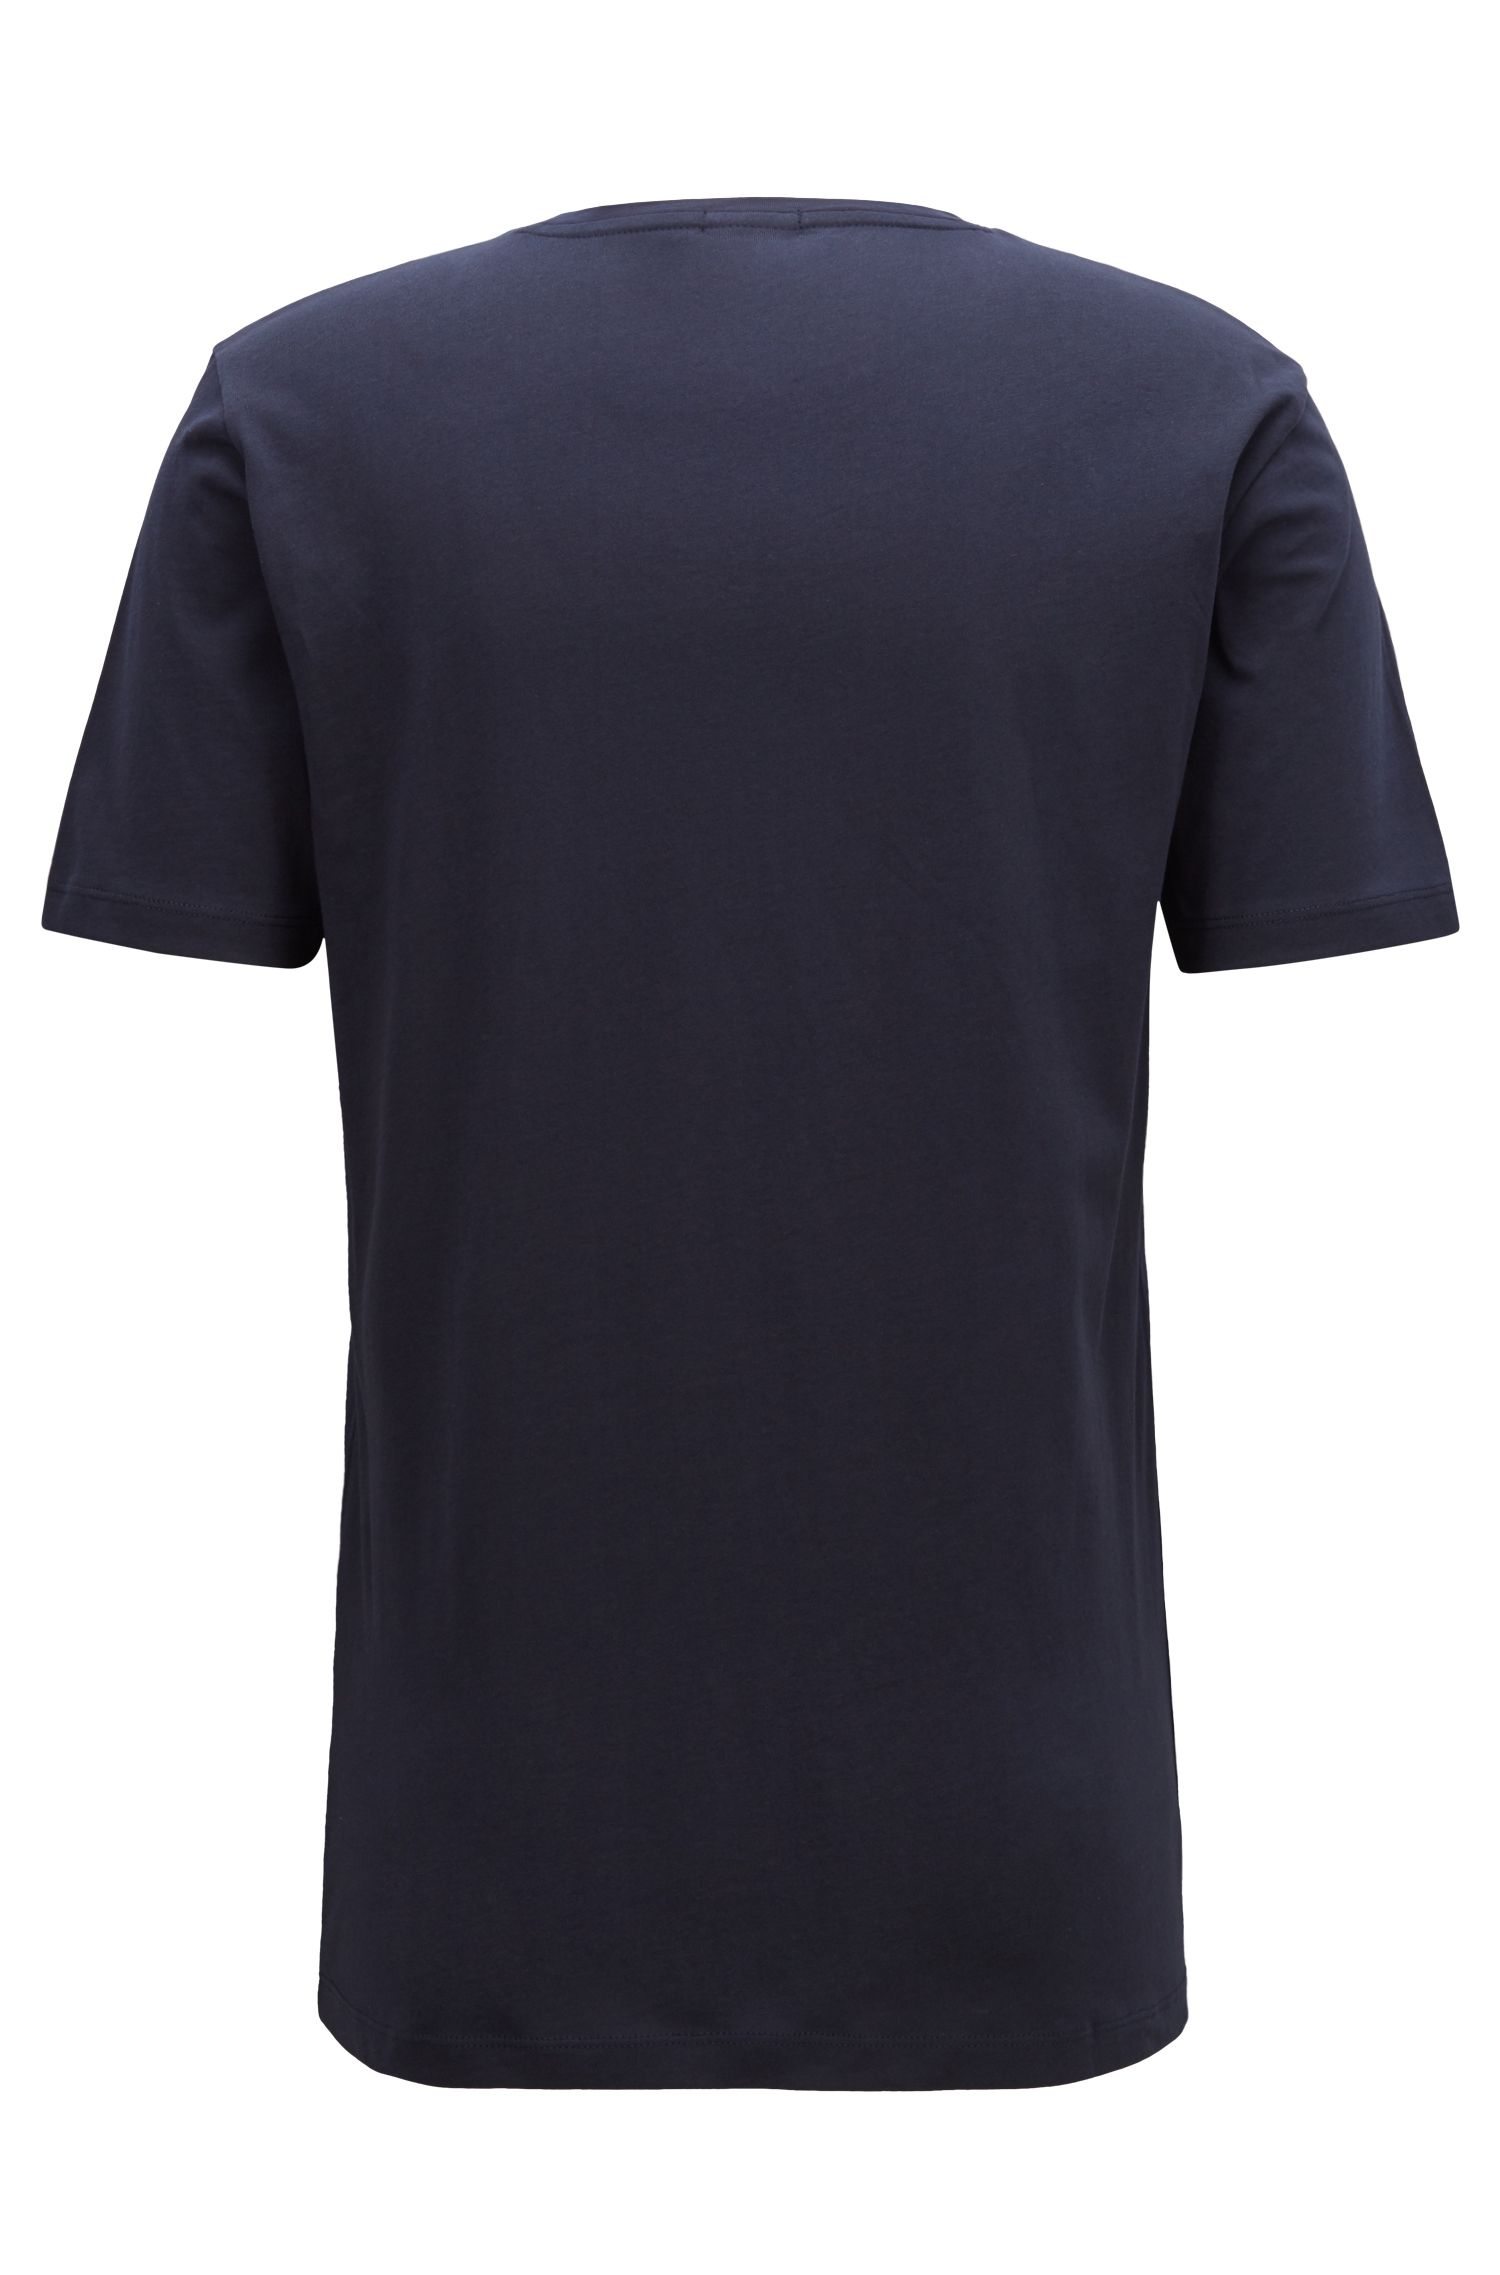 Camiseta regular fit en algodón con logo tridimensional, Azul oscuro